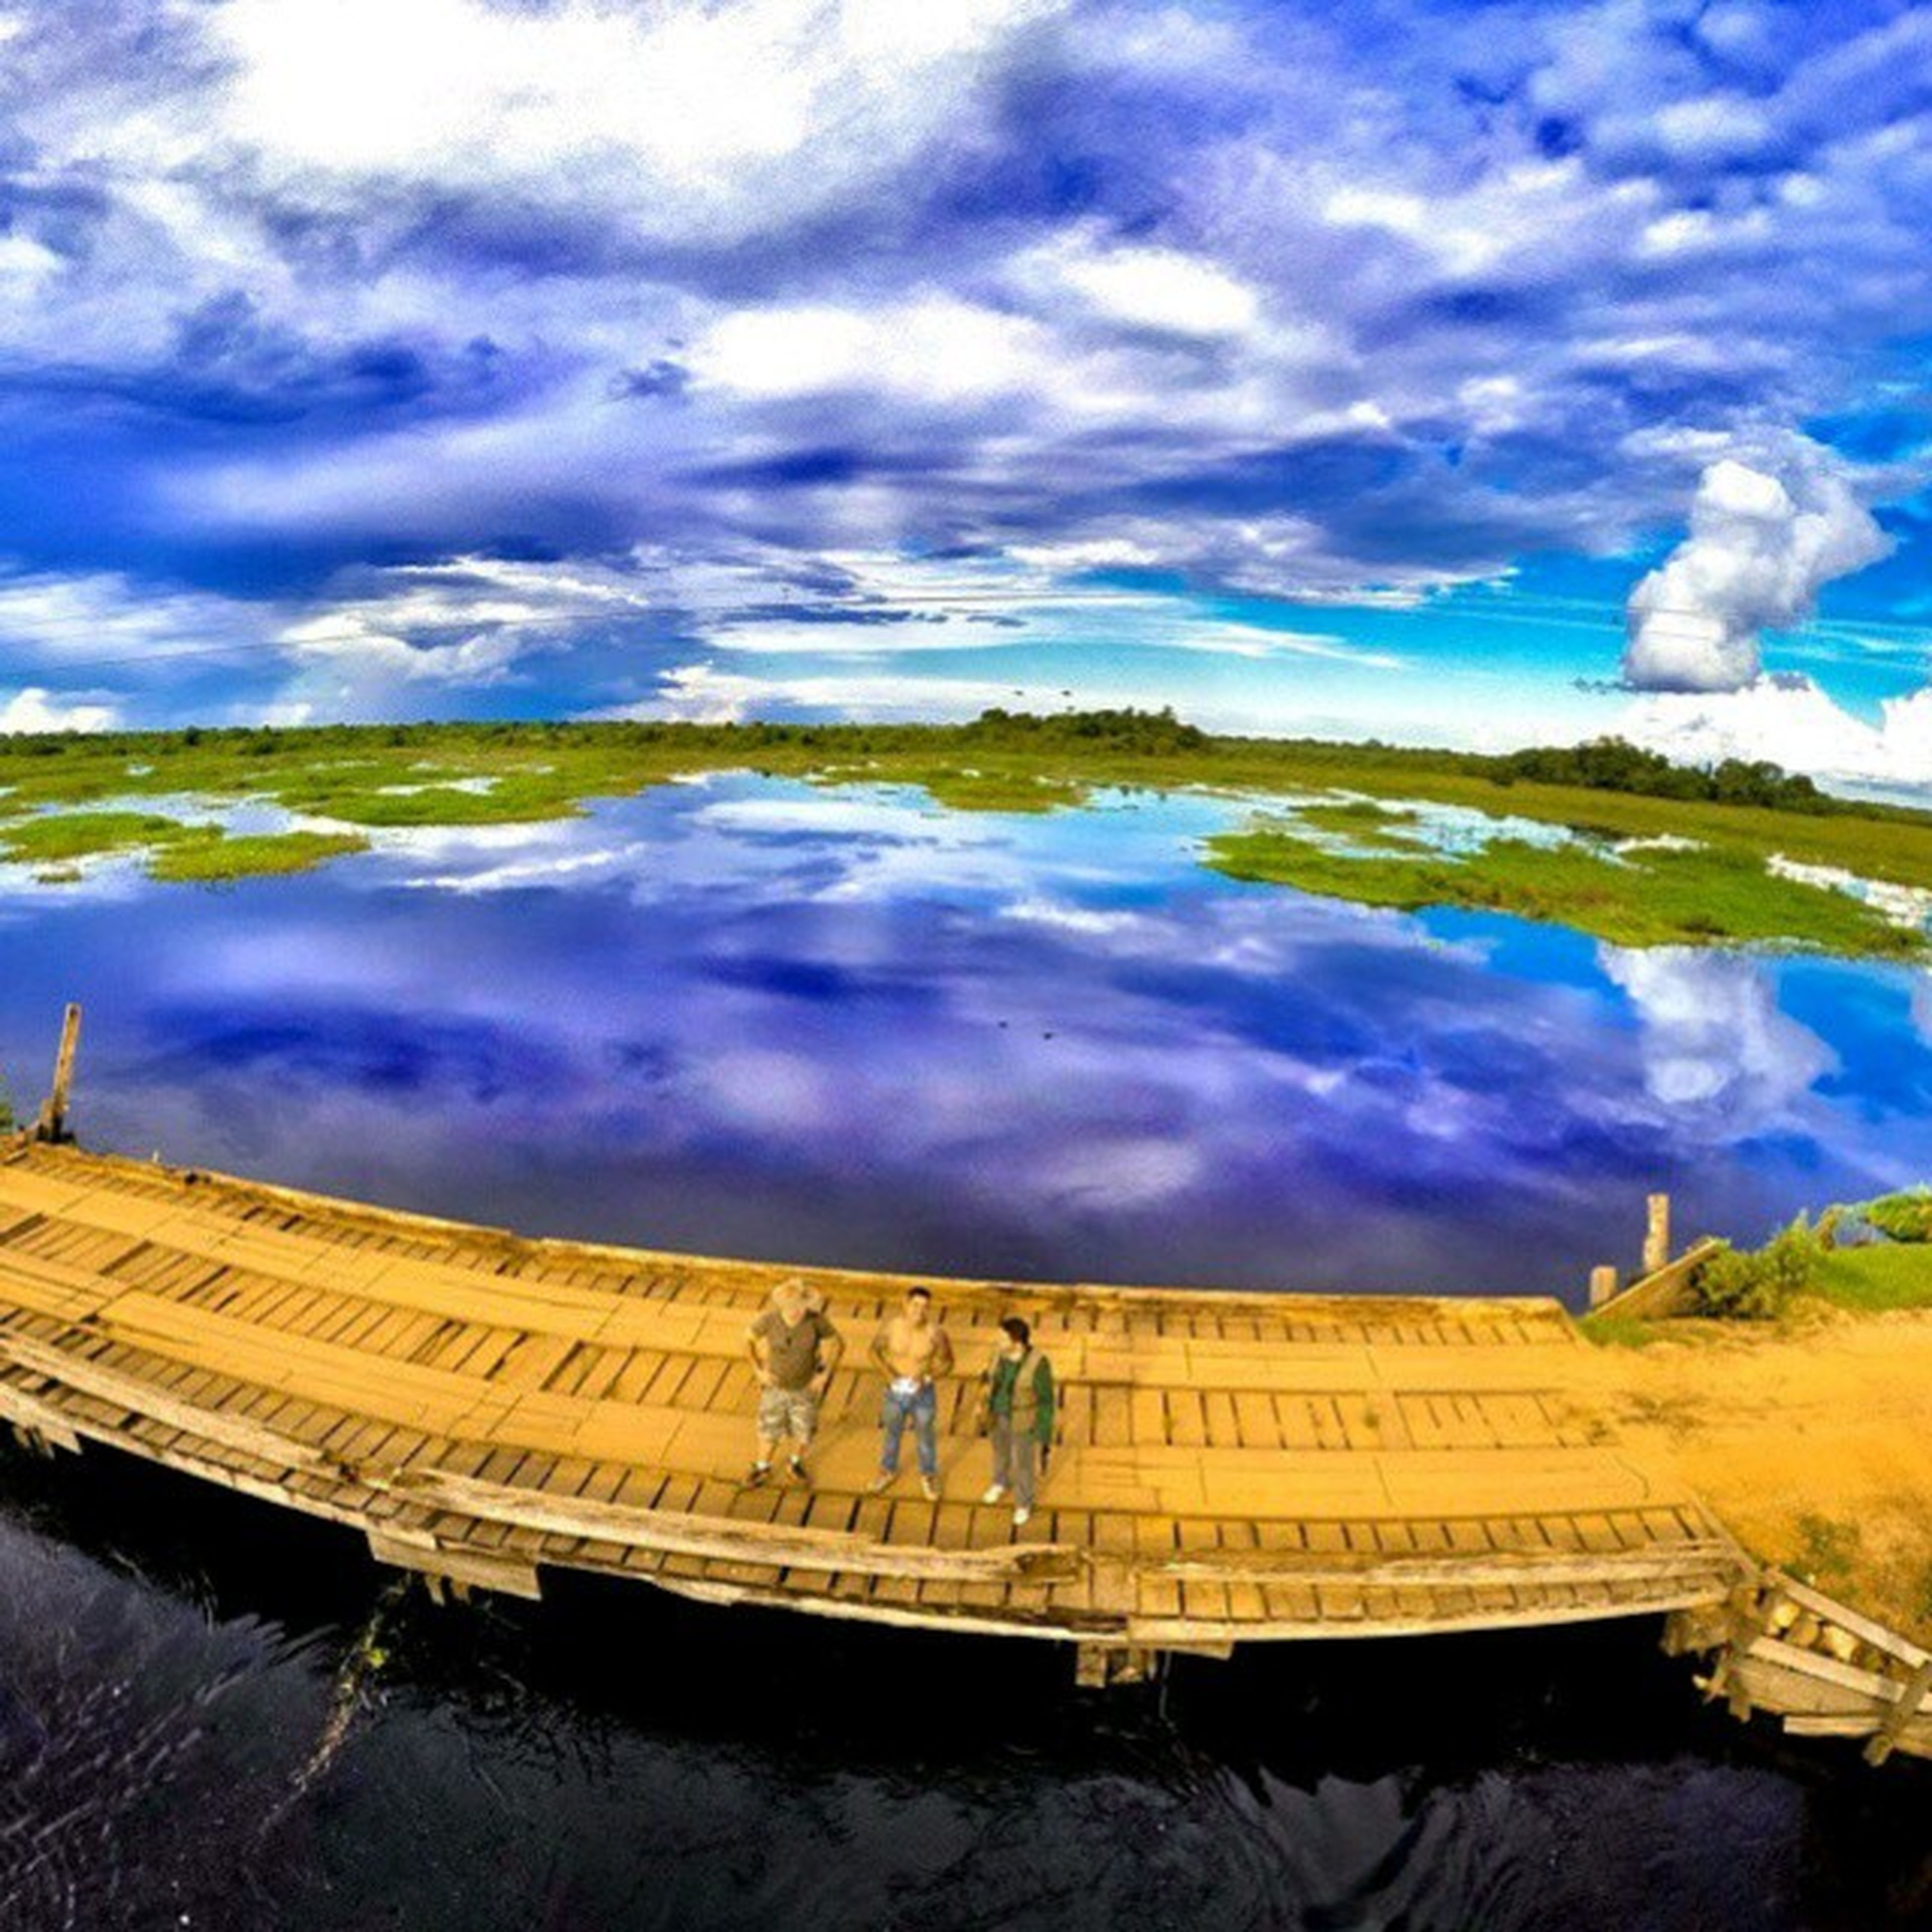 O Pantanal Mato-Grossense ____________________________________________ PantanalMt World Brazilien Brazil Brasil Nature Southamerica America PantanalMatoGrossense VejaMatoGrosso IloveBrazil Matogrosso Javalifilms Pantanal Bresil  VisitBrazil MatoGrosso_Brasil CéudeMT Instagram